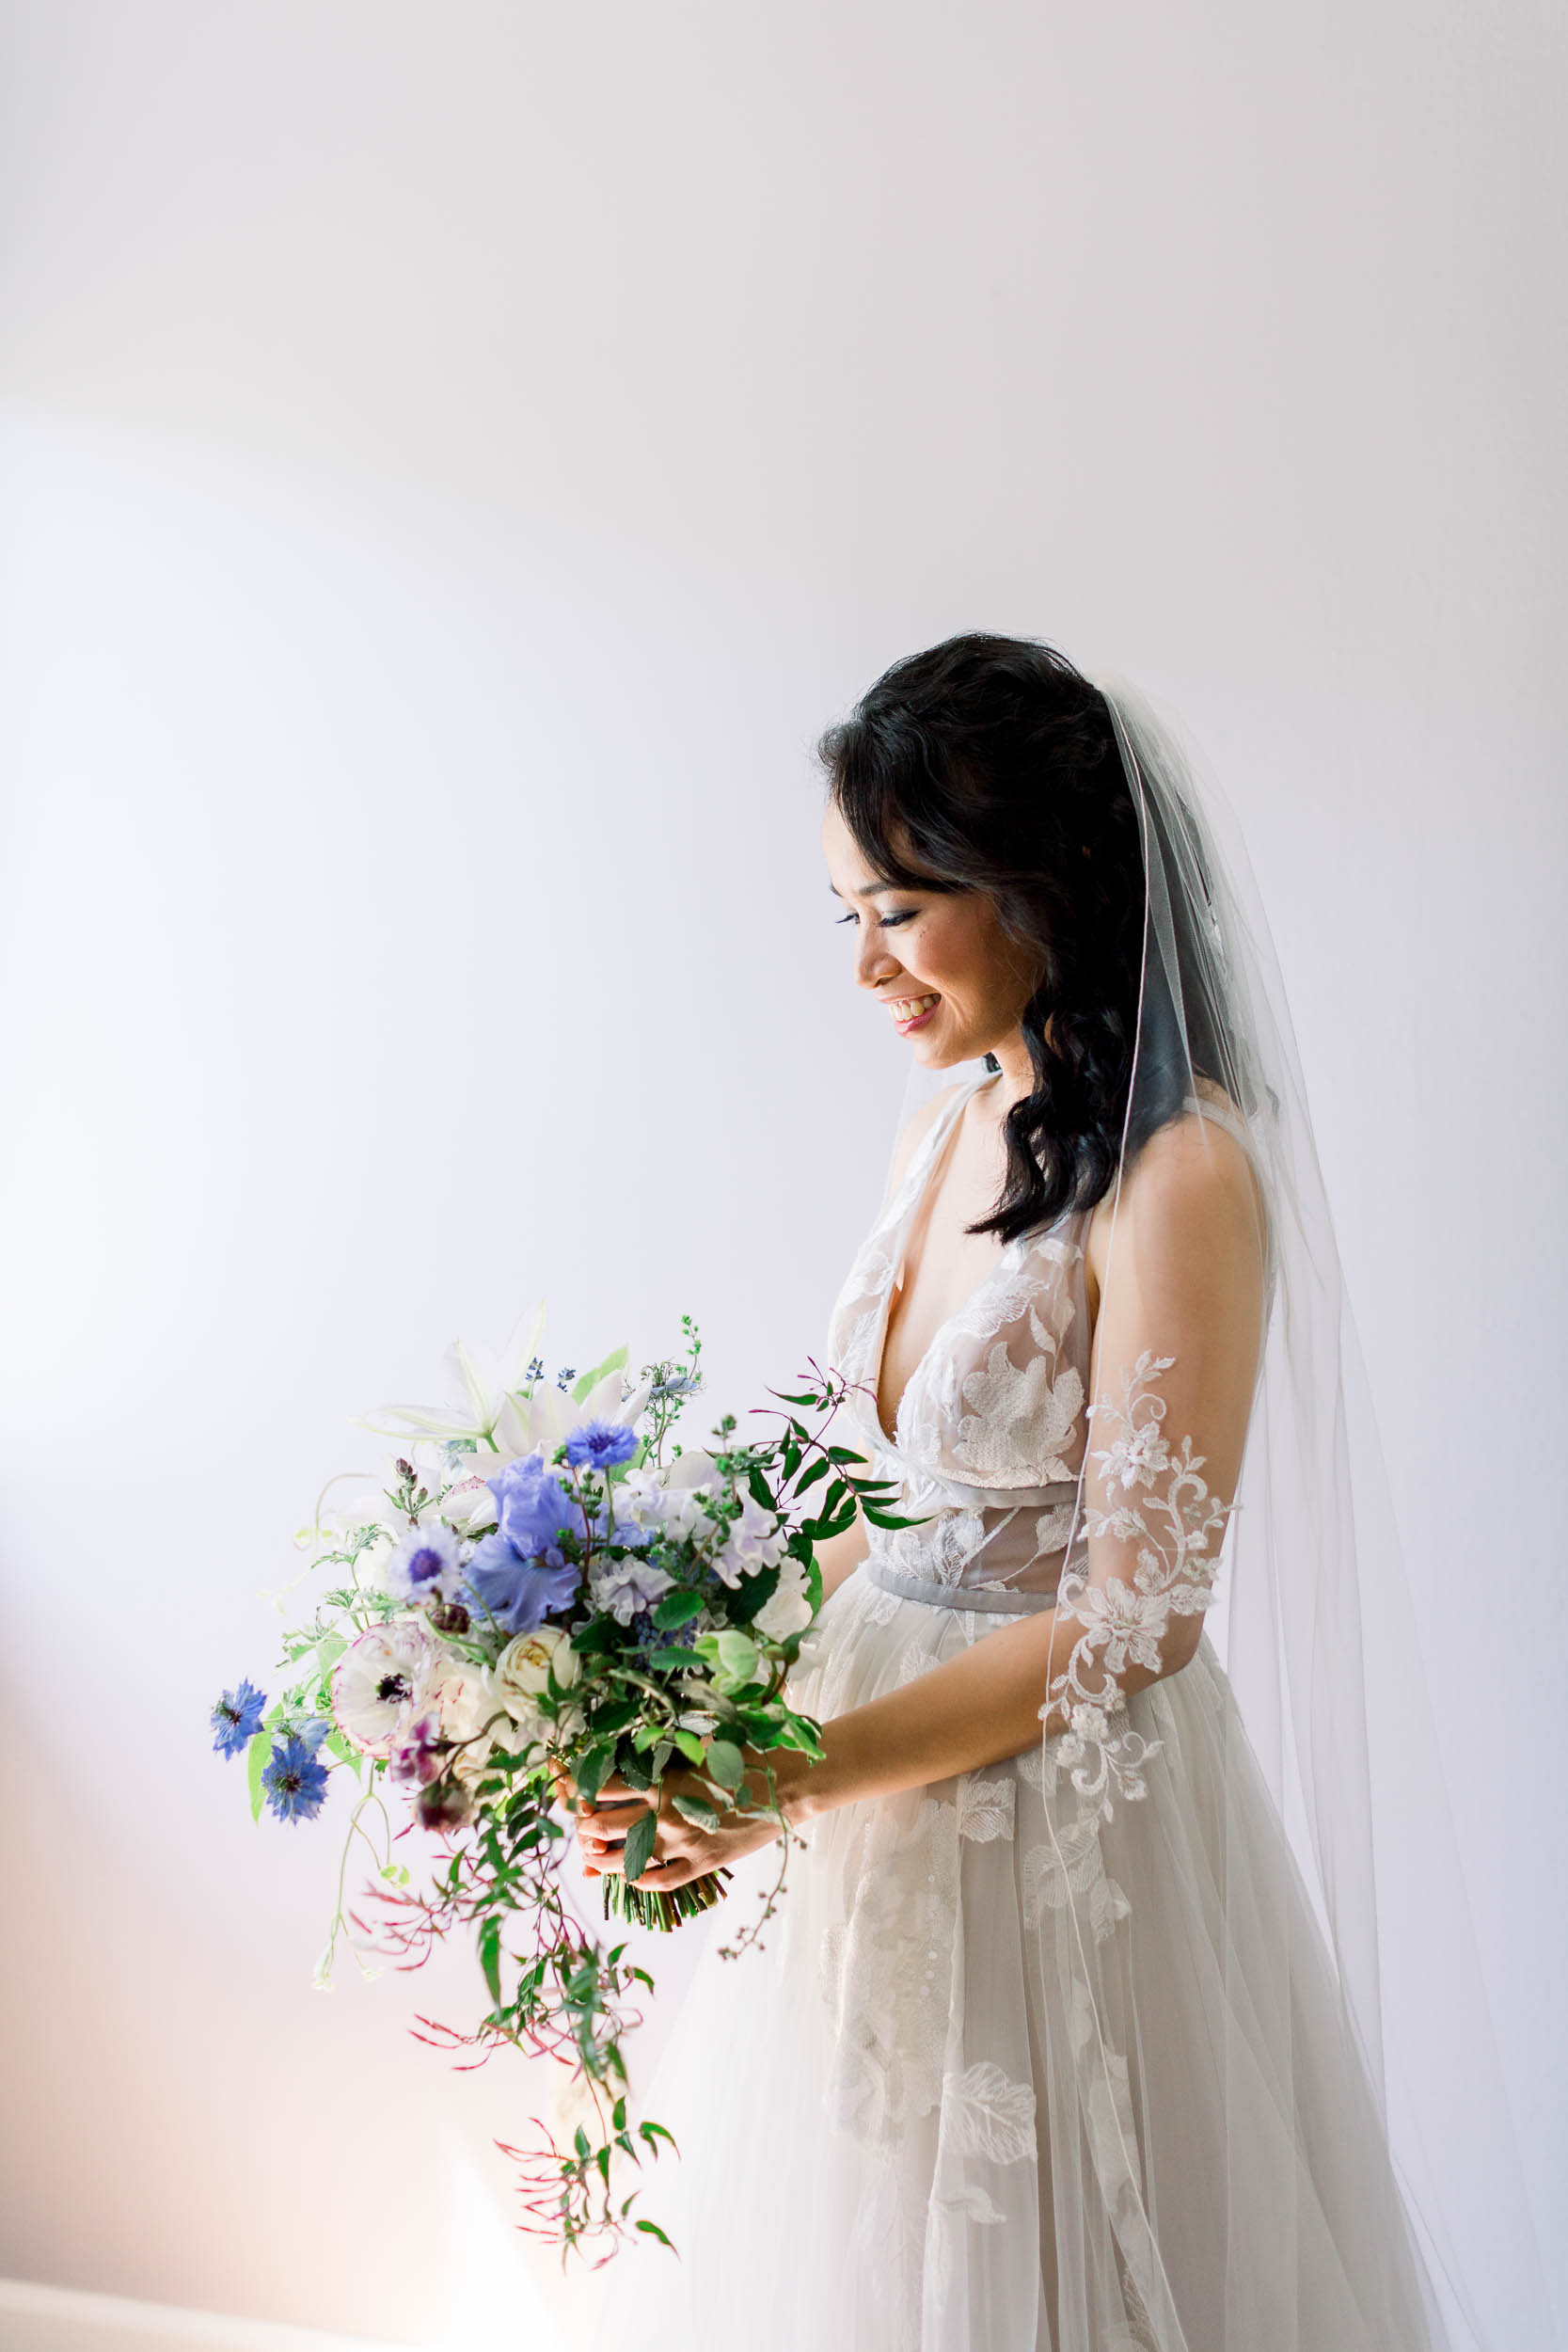 052519_B+S_Hidden Villa Wedding_Buena Lane Photography_052519_0127CY.jpg